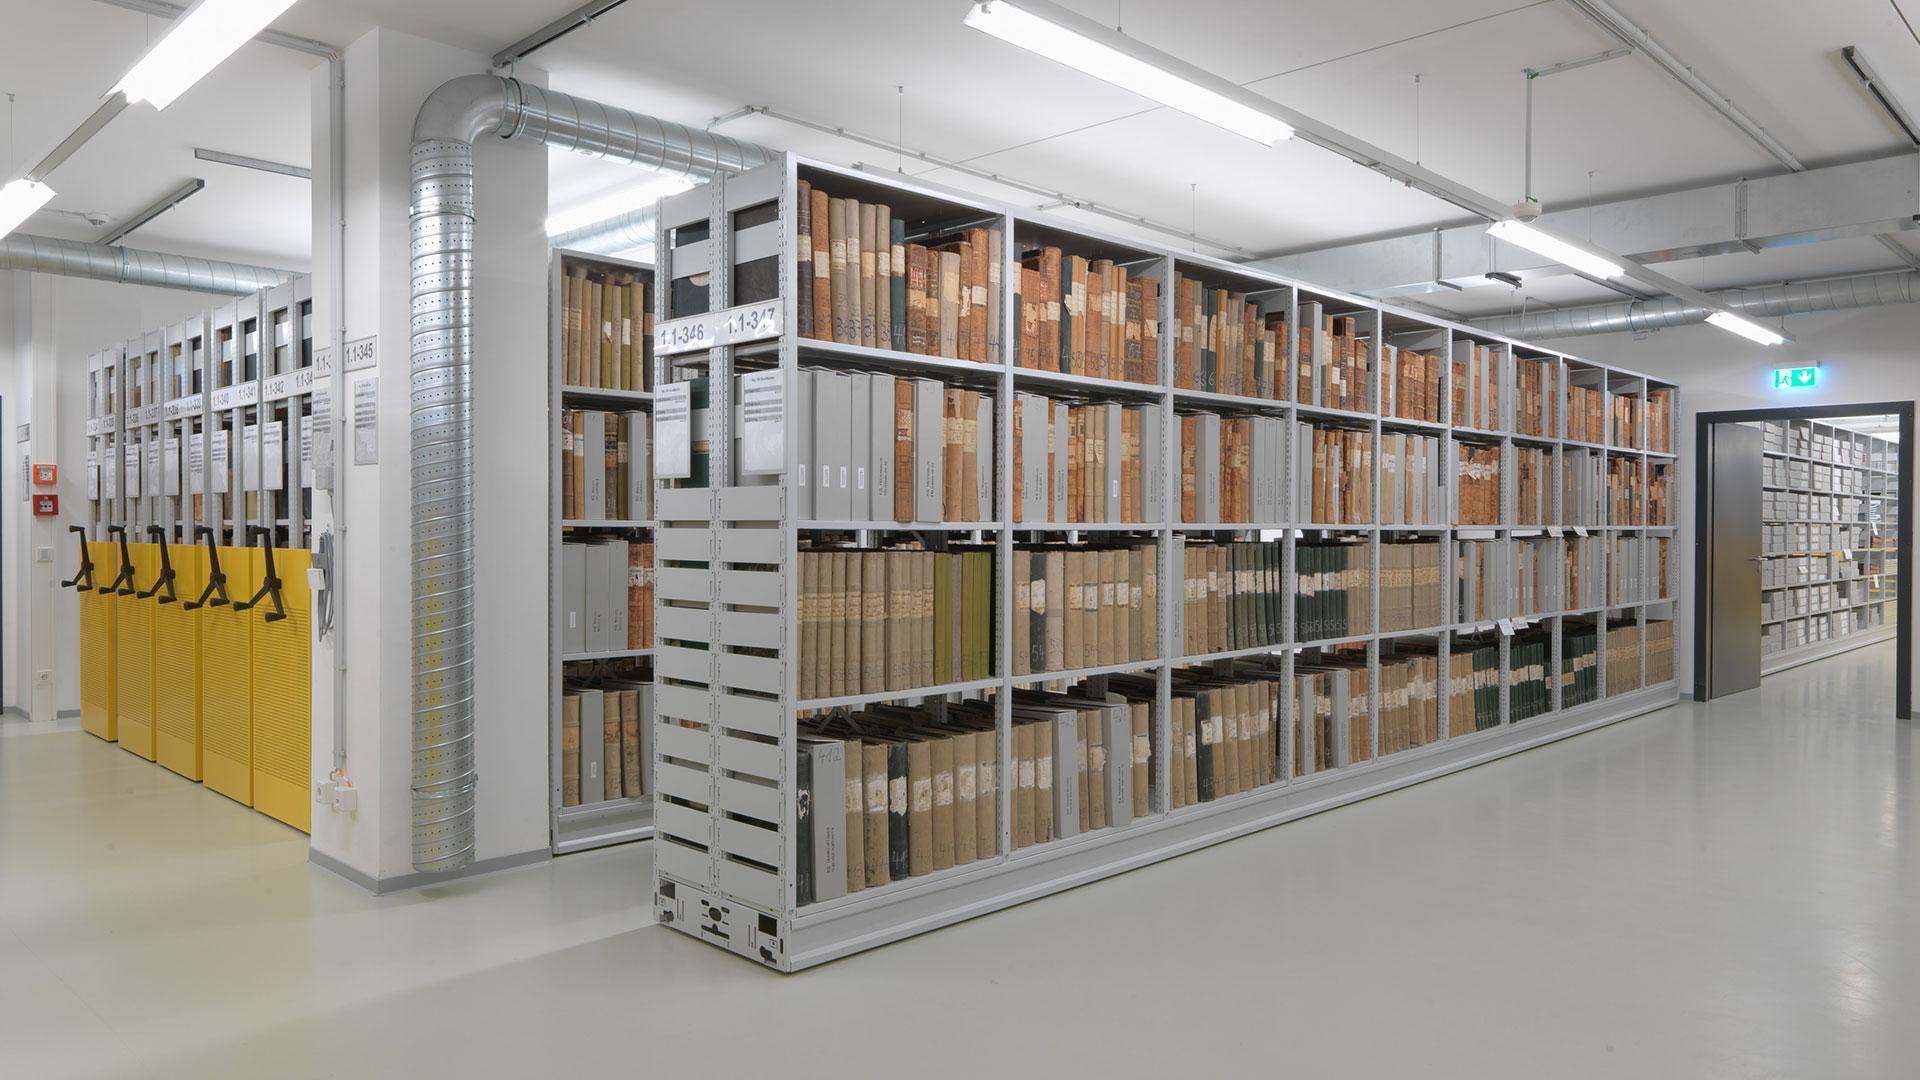 Regalsysteme-Archivregal-Rollregal-Buecher-2-RR409-mauser-16-9